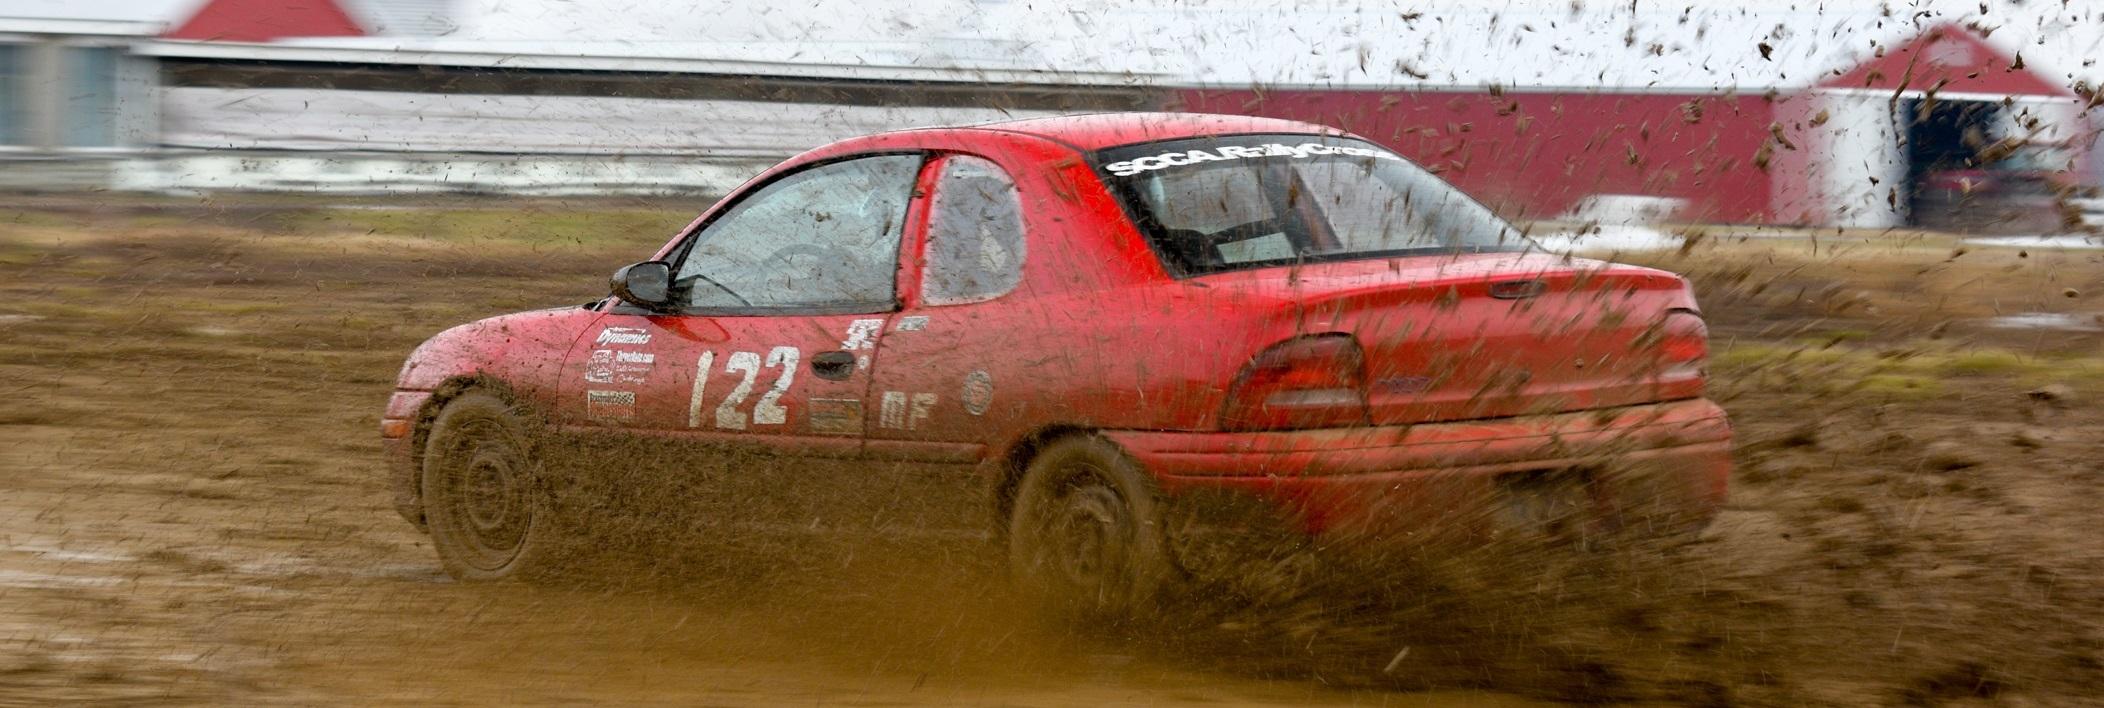 """March Mudbog"" RallyCross Rescheduled"